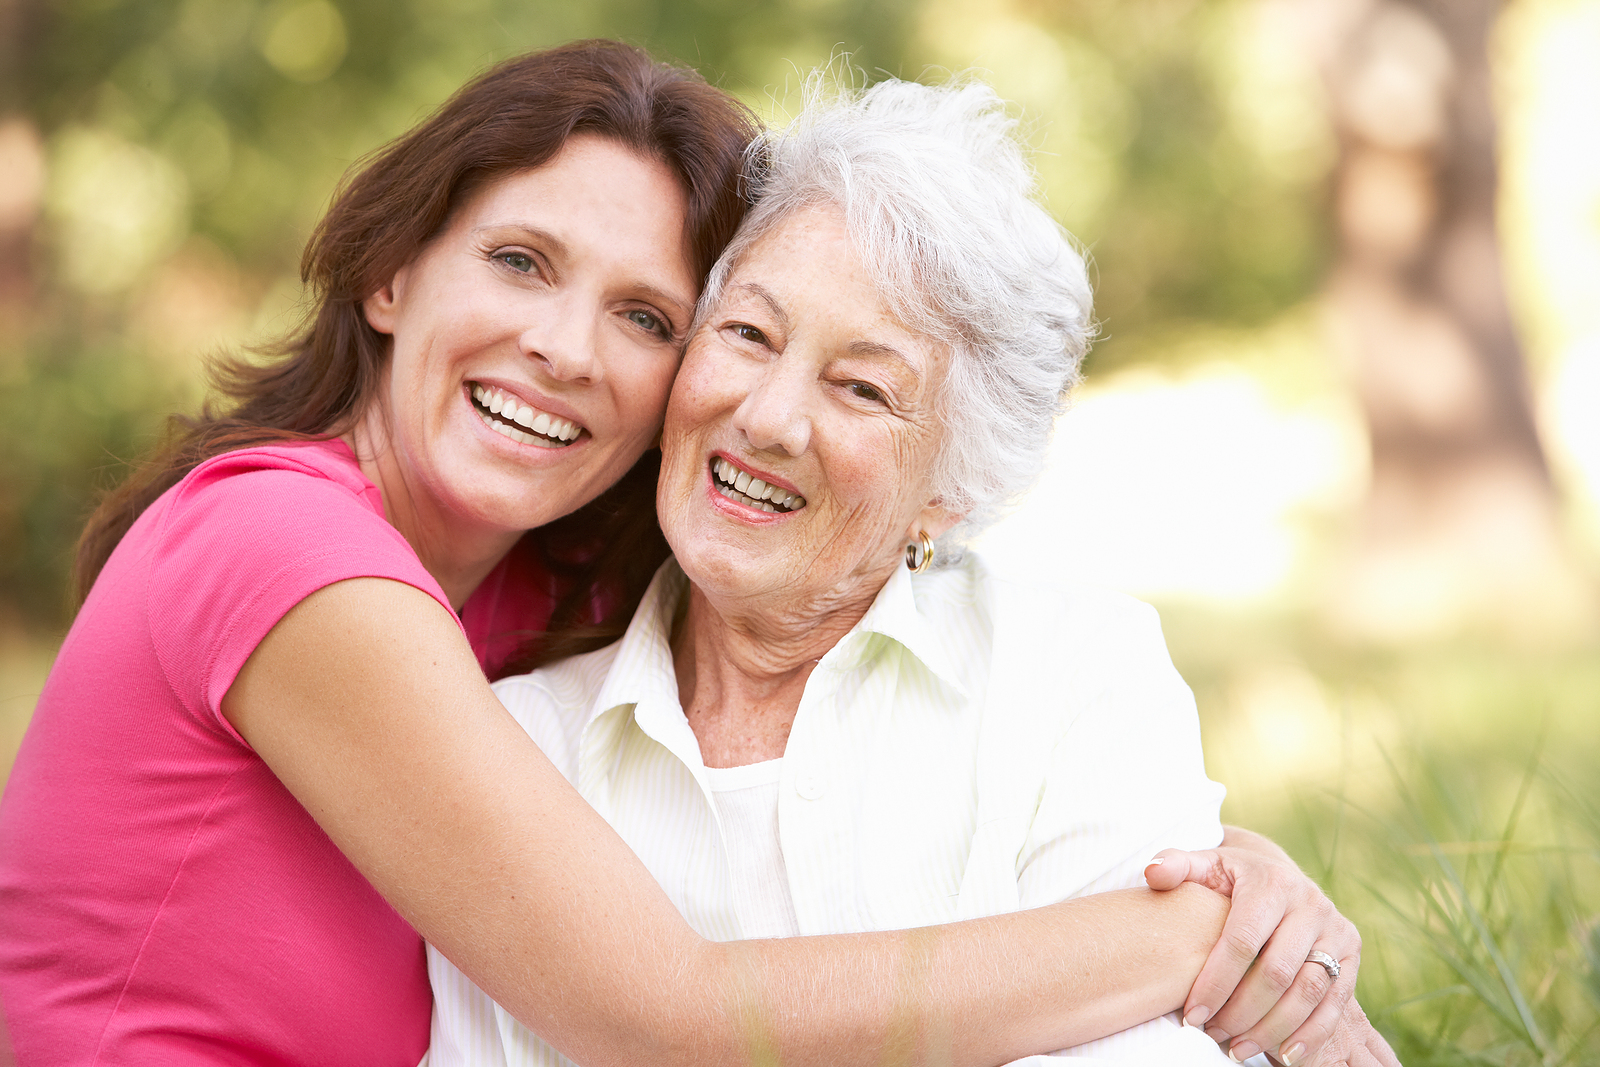 bigstock_Senior_Woman_With_Adult_Daught_13916294.jpg